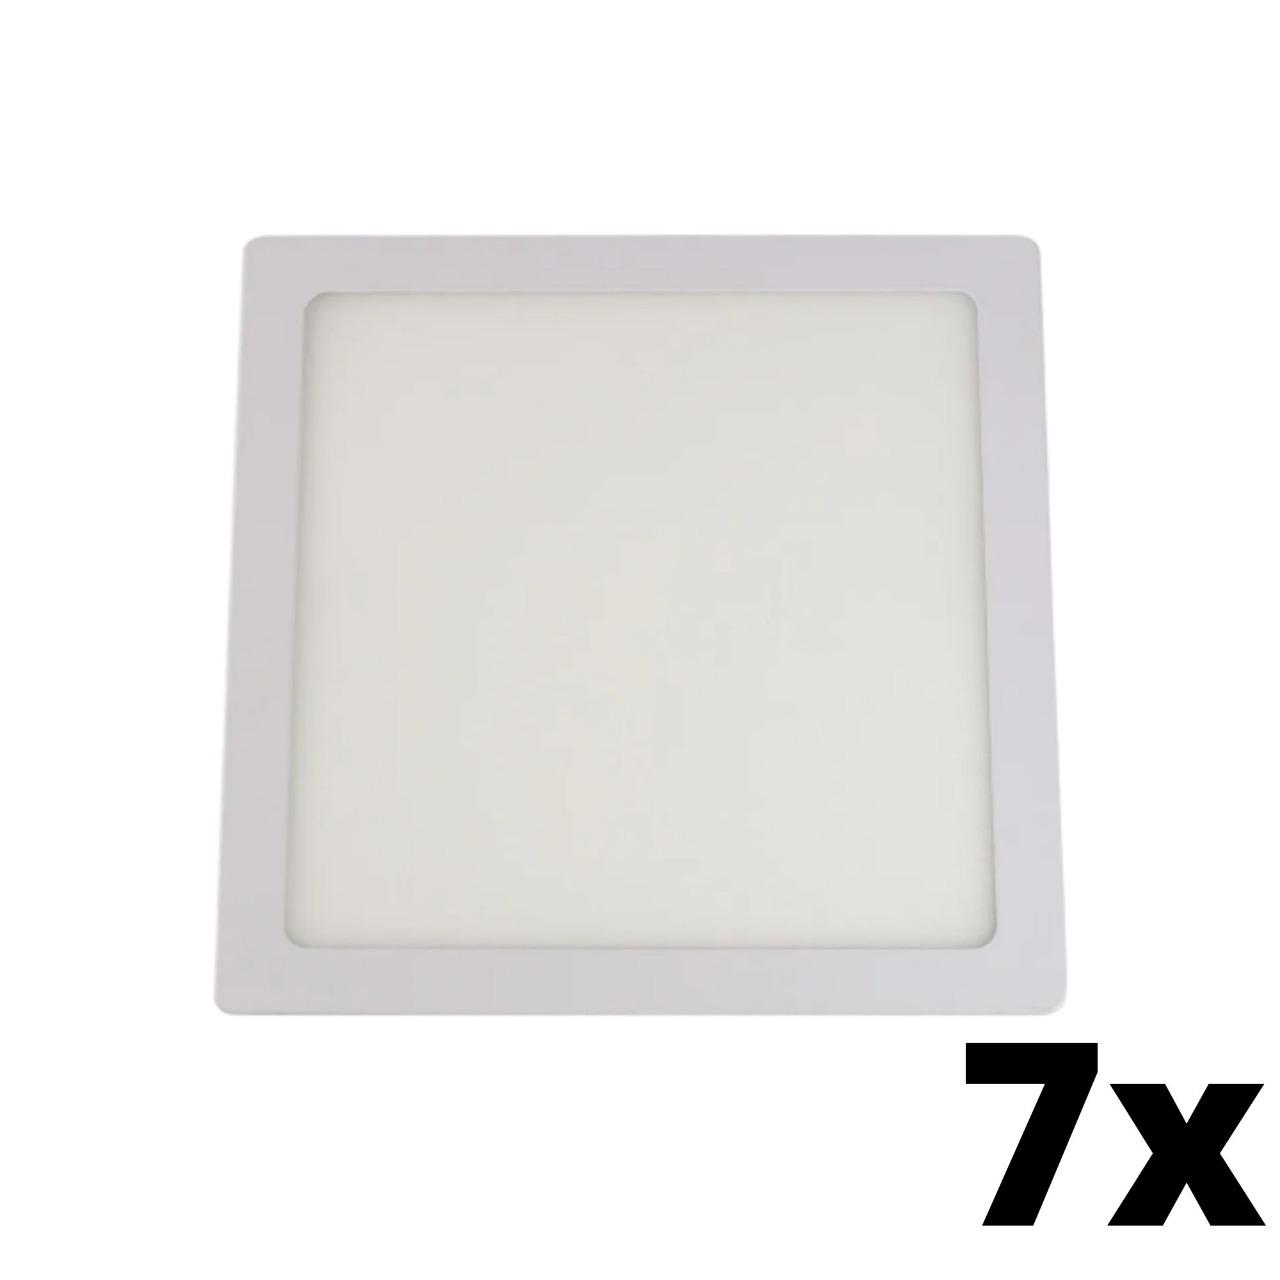 Kit 7 und Painel de Led Embutir 24w Quadrado 6500k